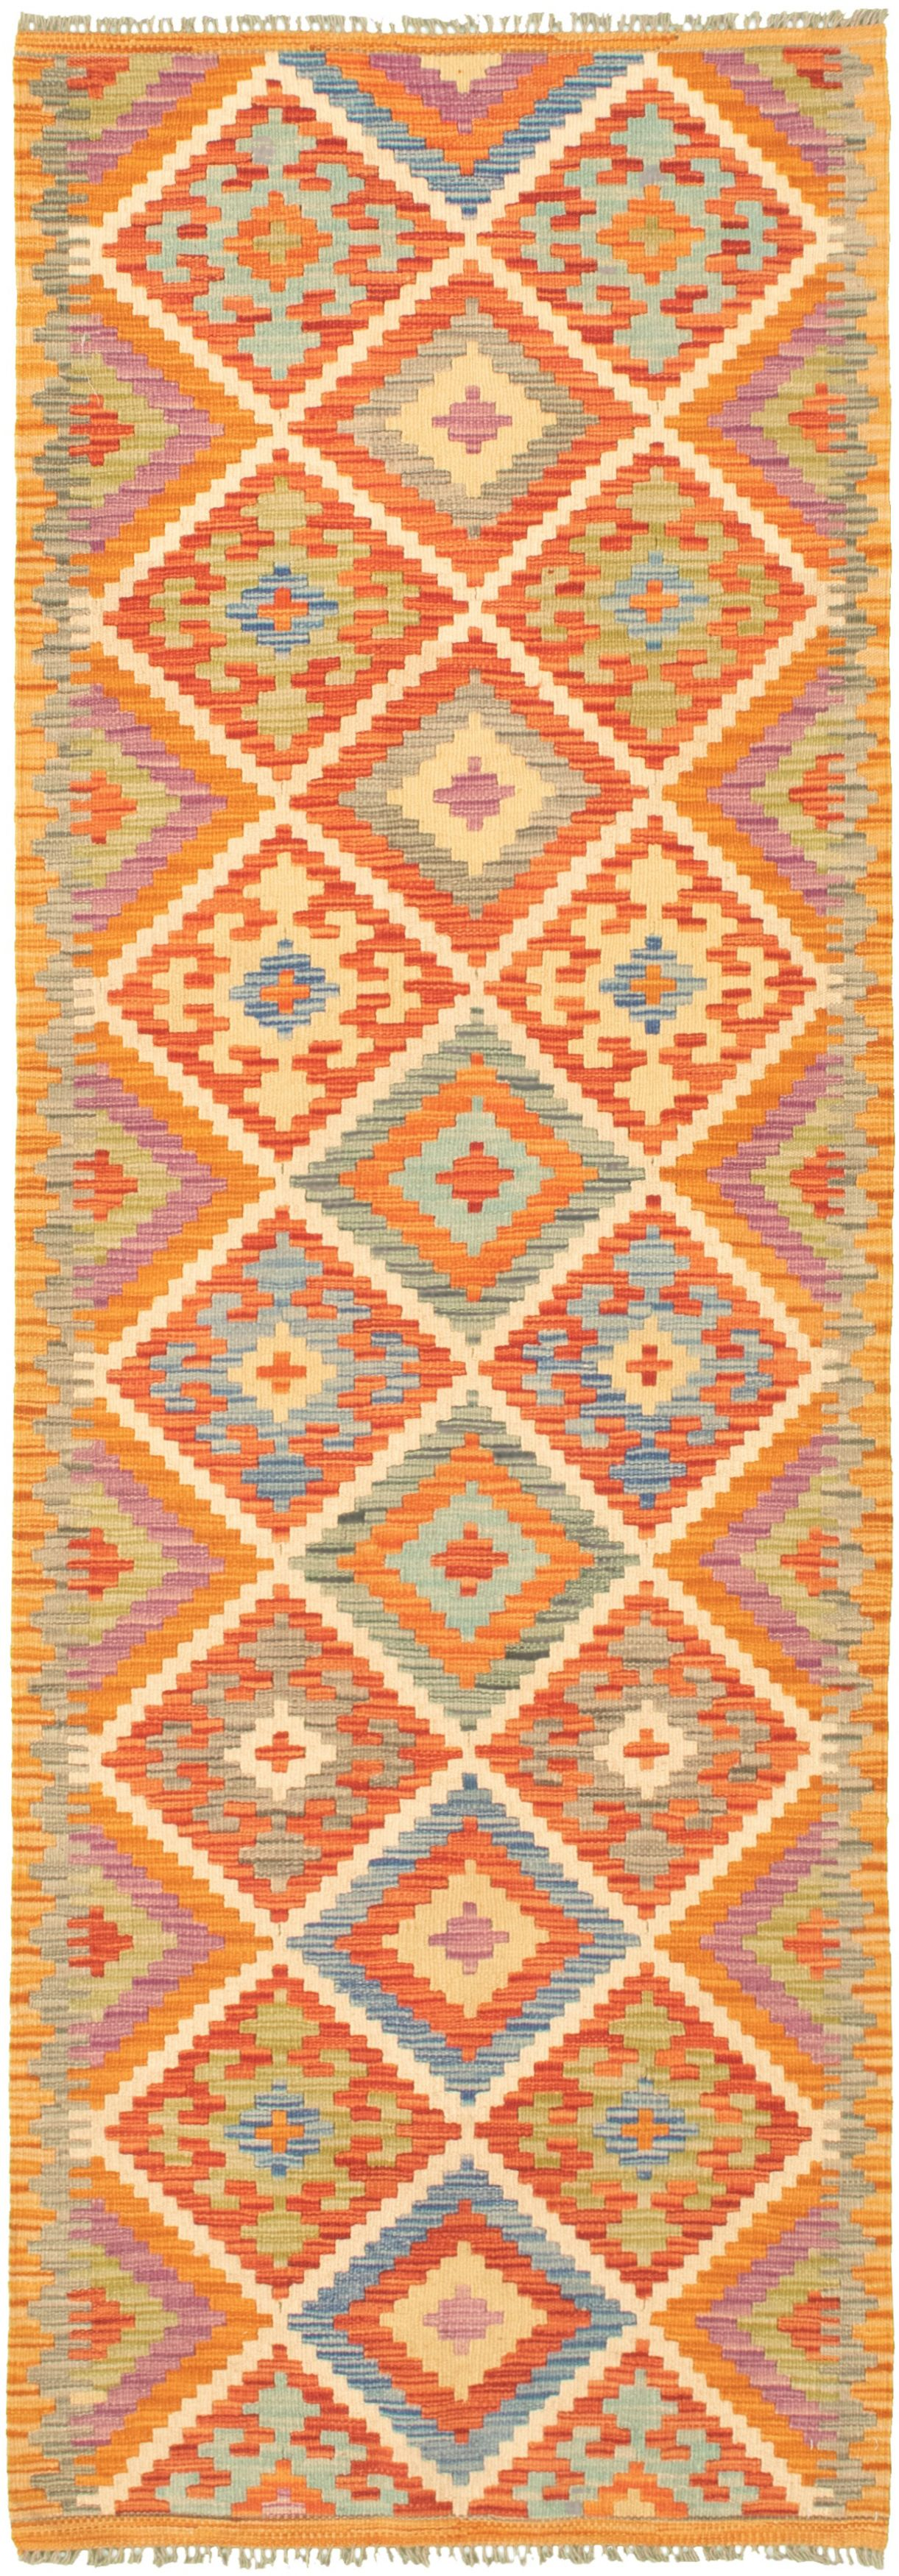 "Hand woven Bold and Colorful  Dark Copper, Light Orange Wool Kilim 2'8"" x 8'3"" Size: 2'8"" x 8'3"""